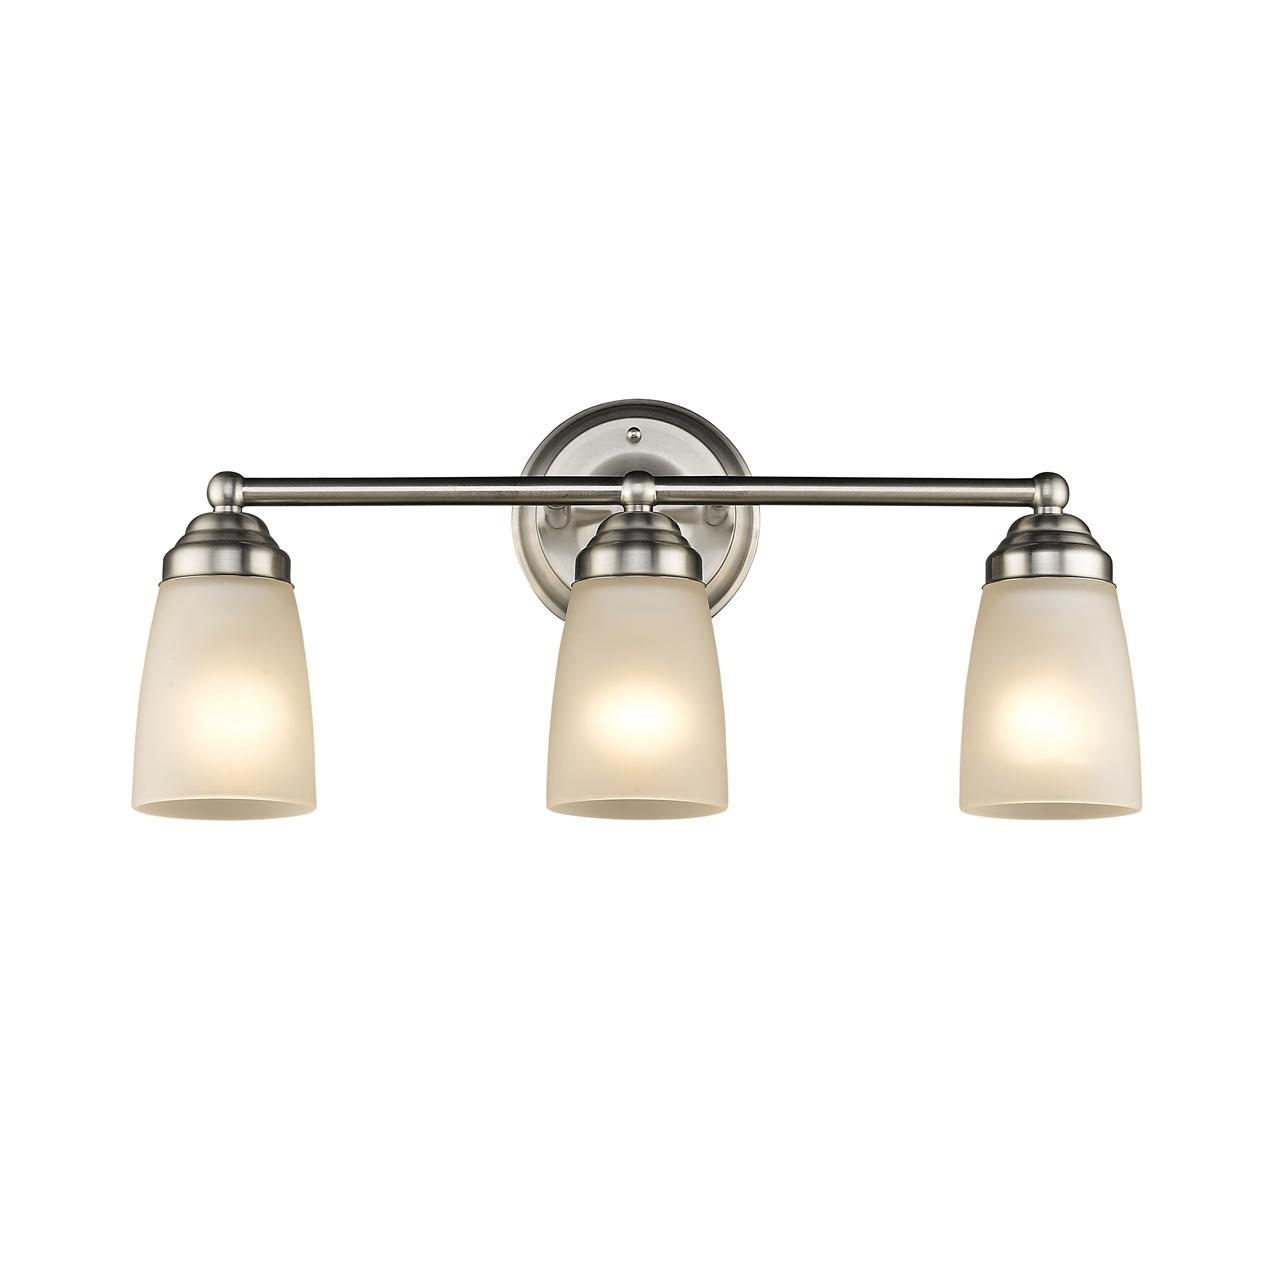 CHLOE Lighting, Inc Lighting wholesale, Lighting wholesalers, Tiffany Lamp, Tiffany Lamps ...